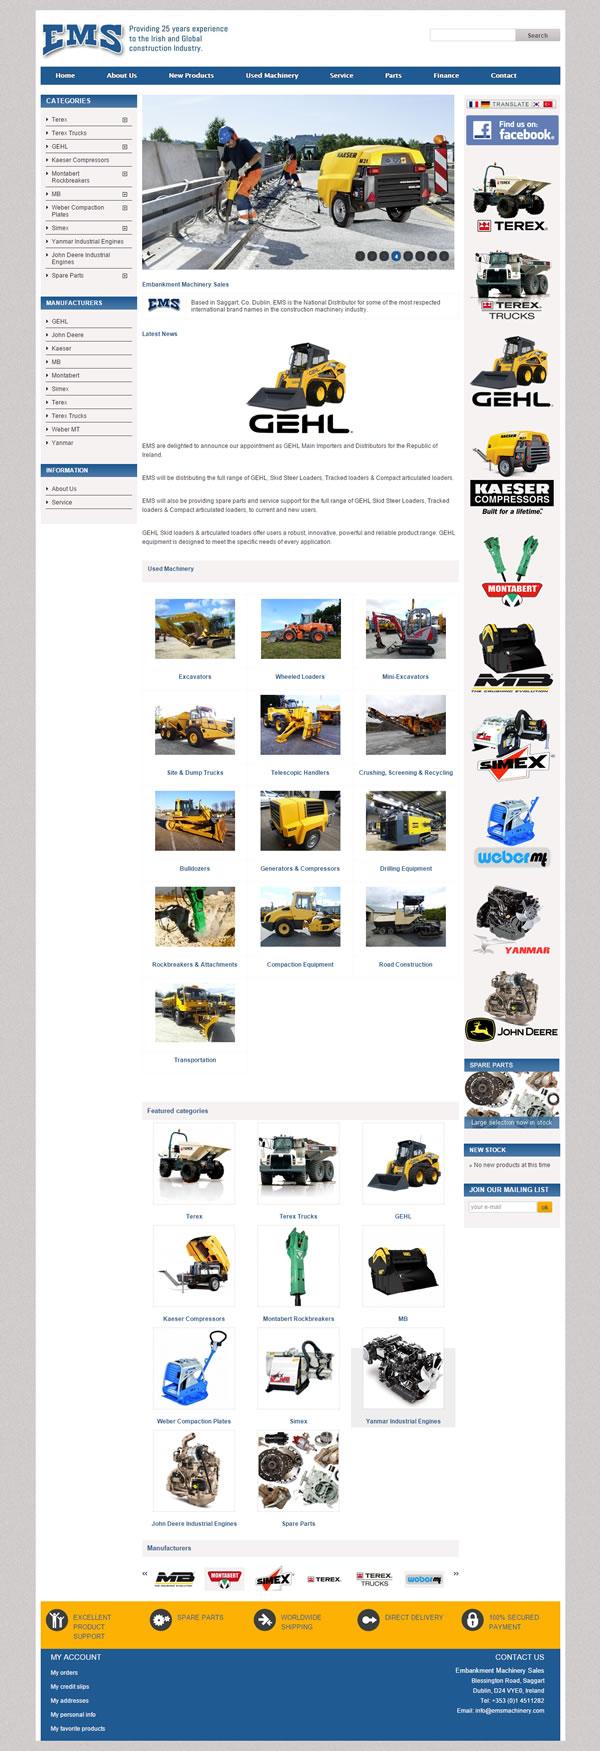 EMS Machinery Sales Ecommerce Website Design Ireland